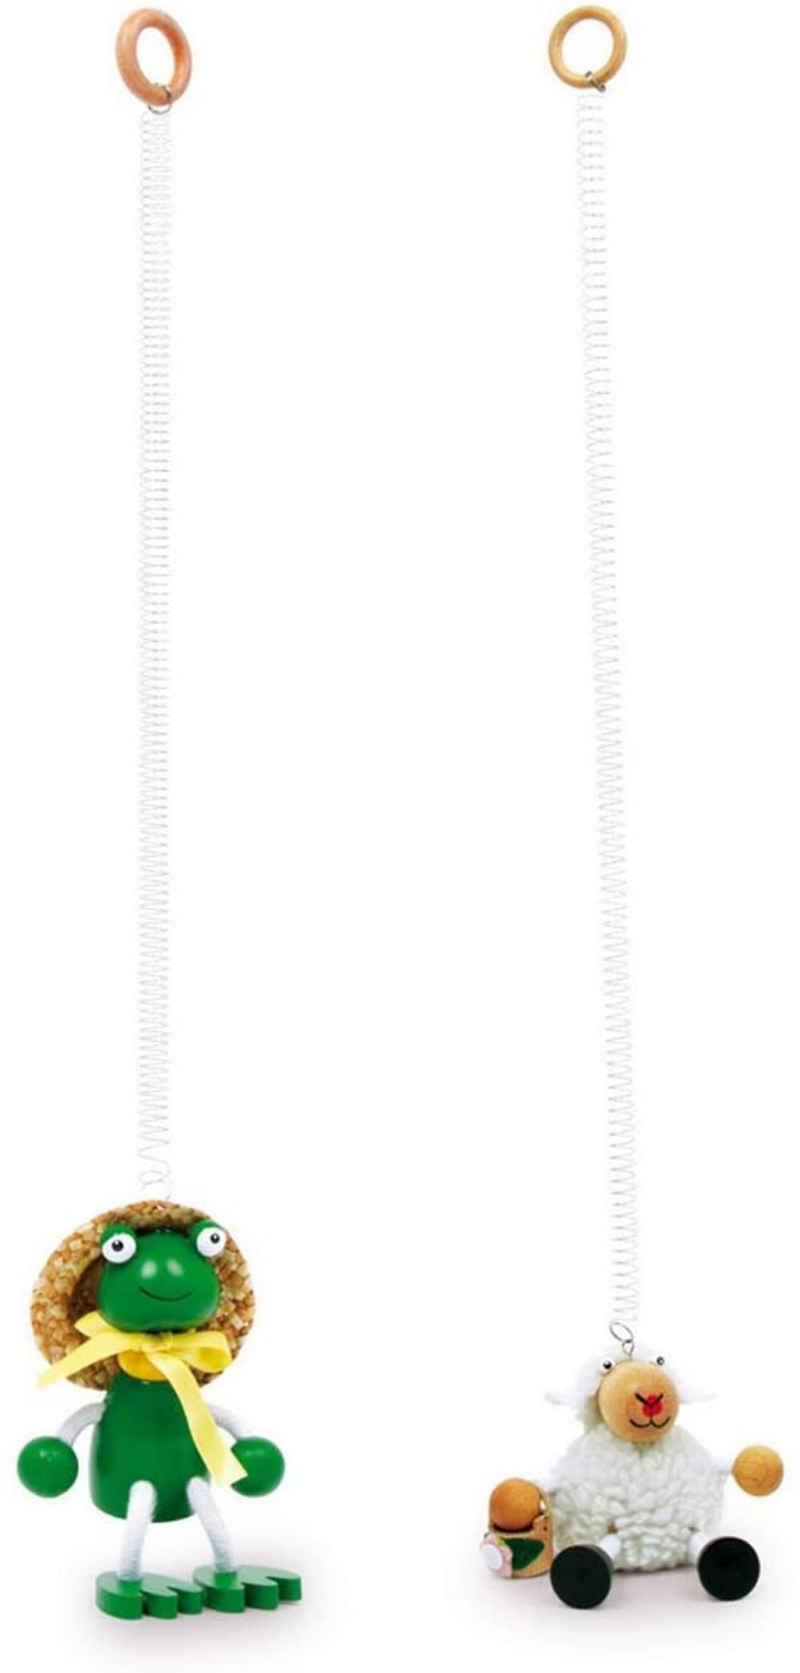 LeNoSa Hängefigur »JUMPER • Holz Tier Figur • Hängedekoration federnde Tiere • ca. 10 x 7 x 11 cm«